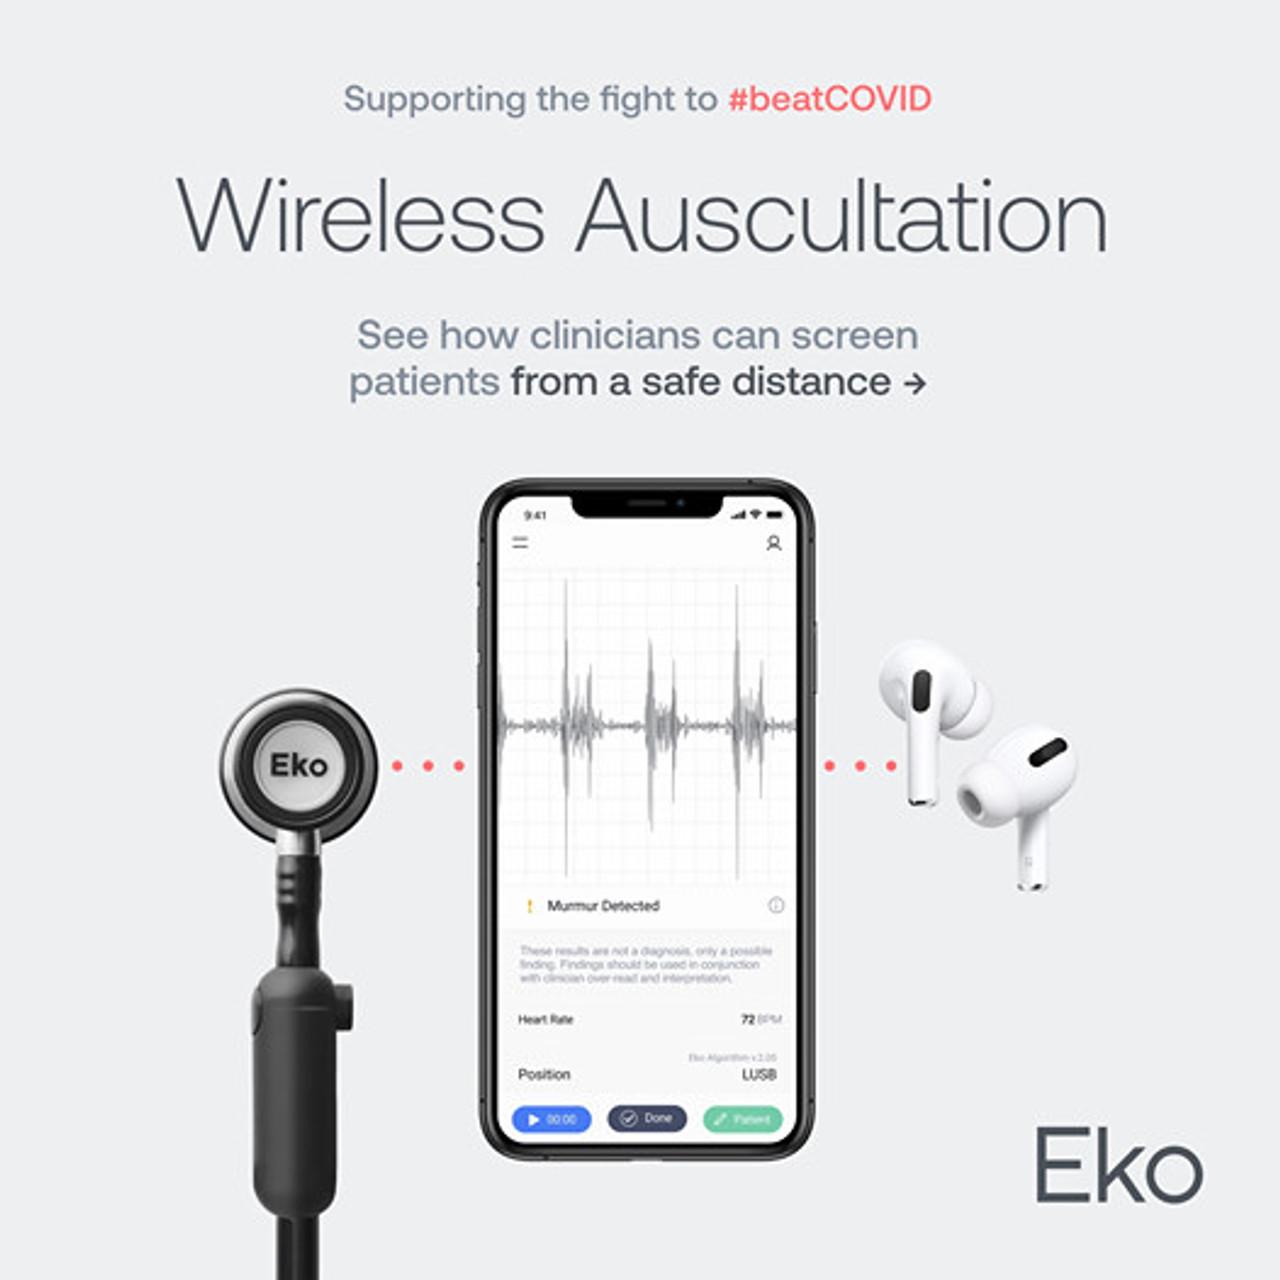 Eko Digital Stethoscope CORE 201